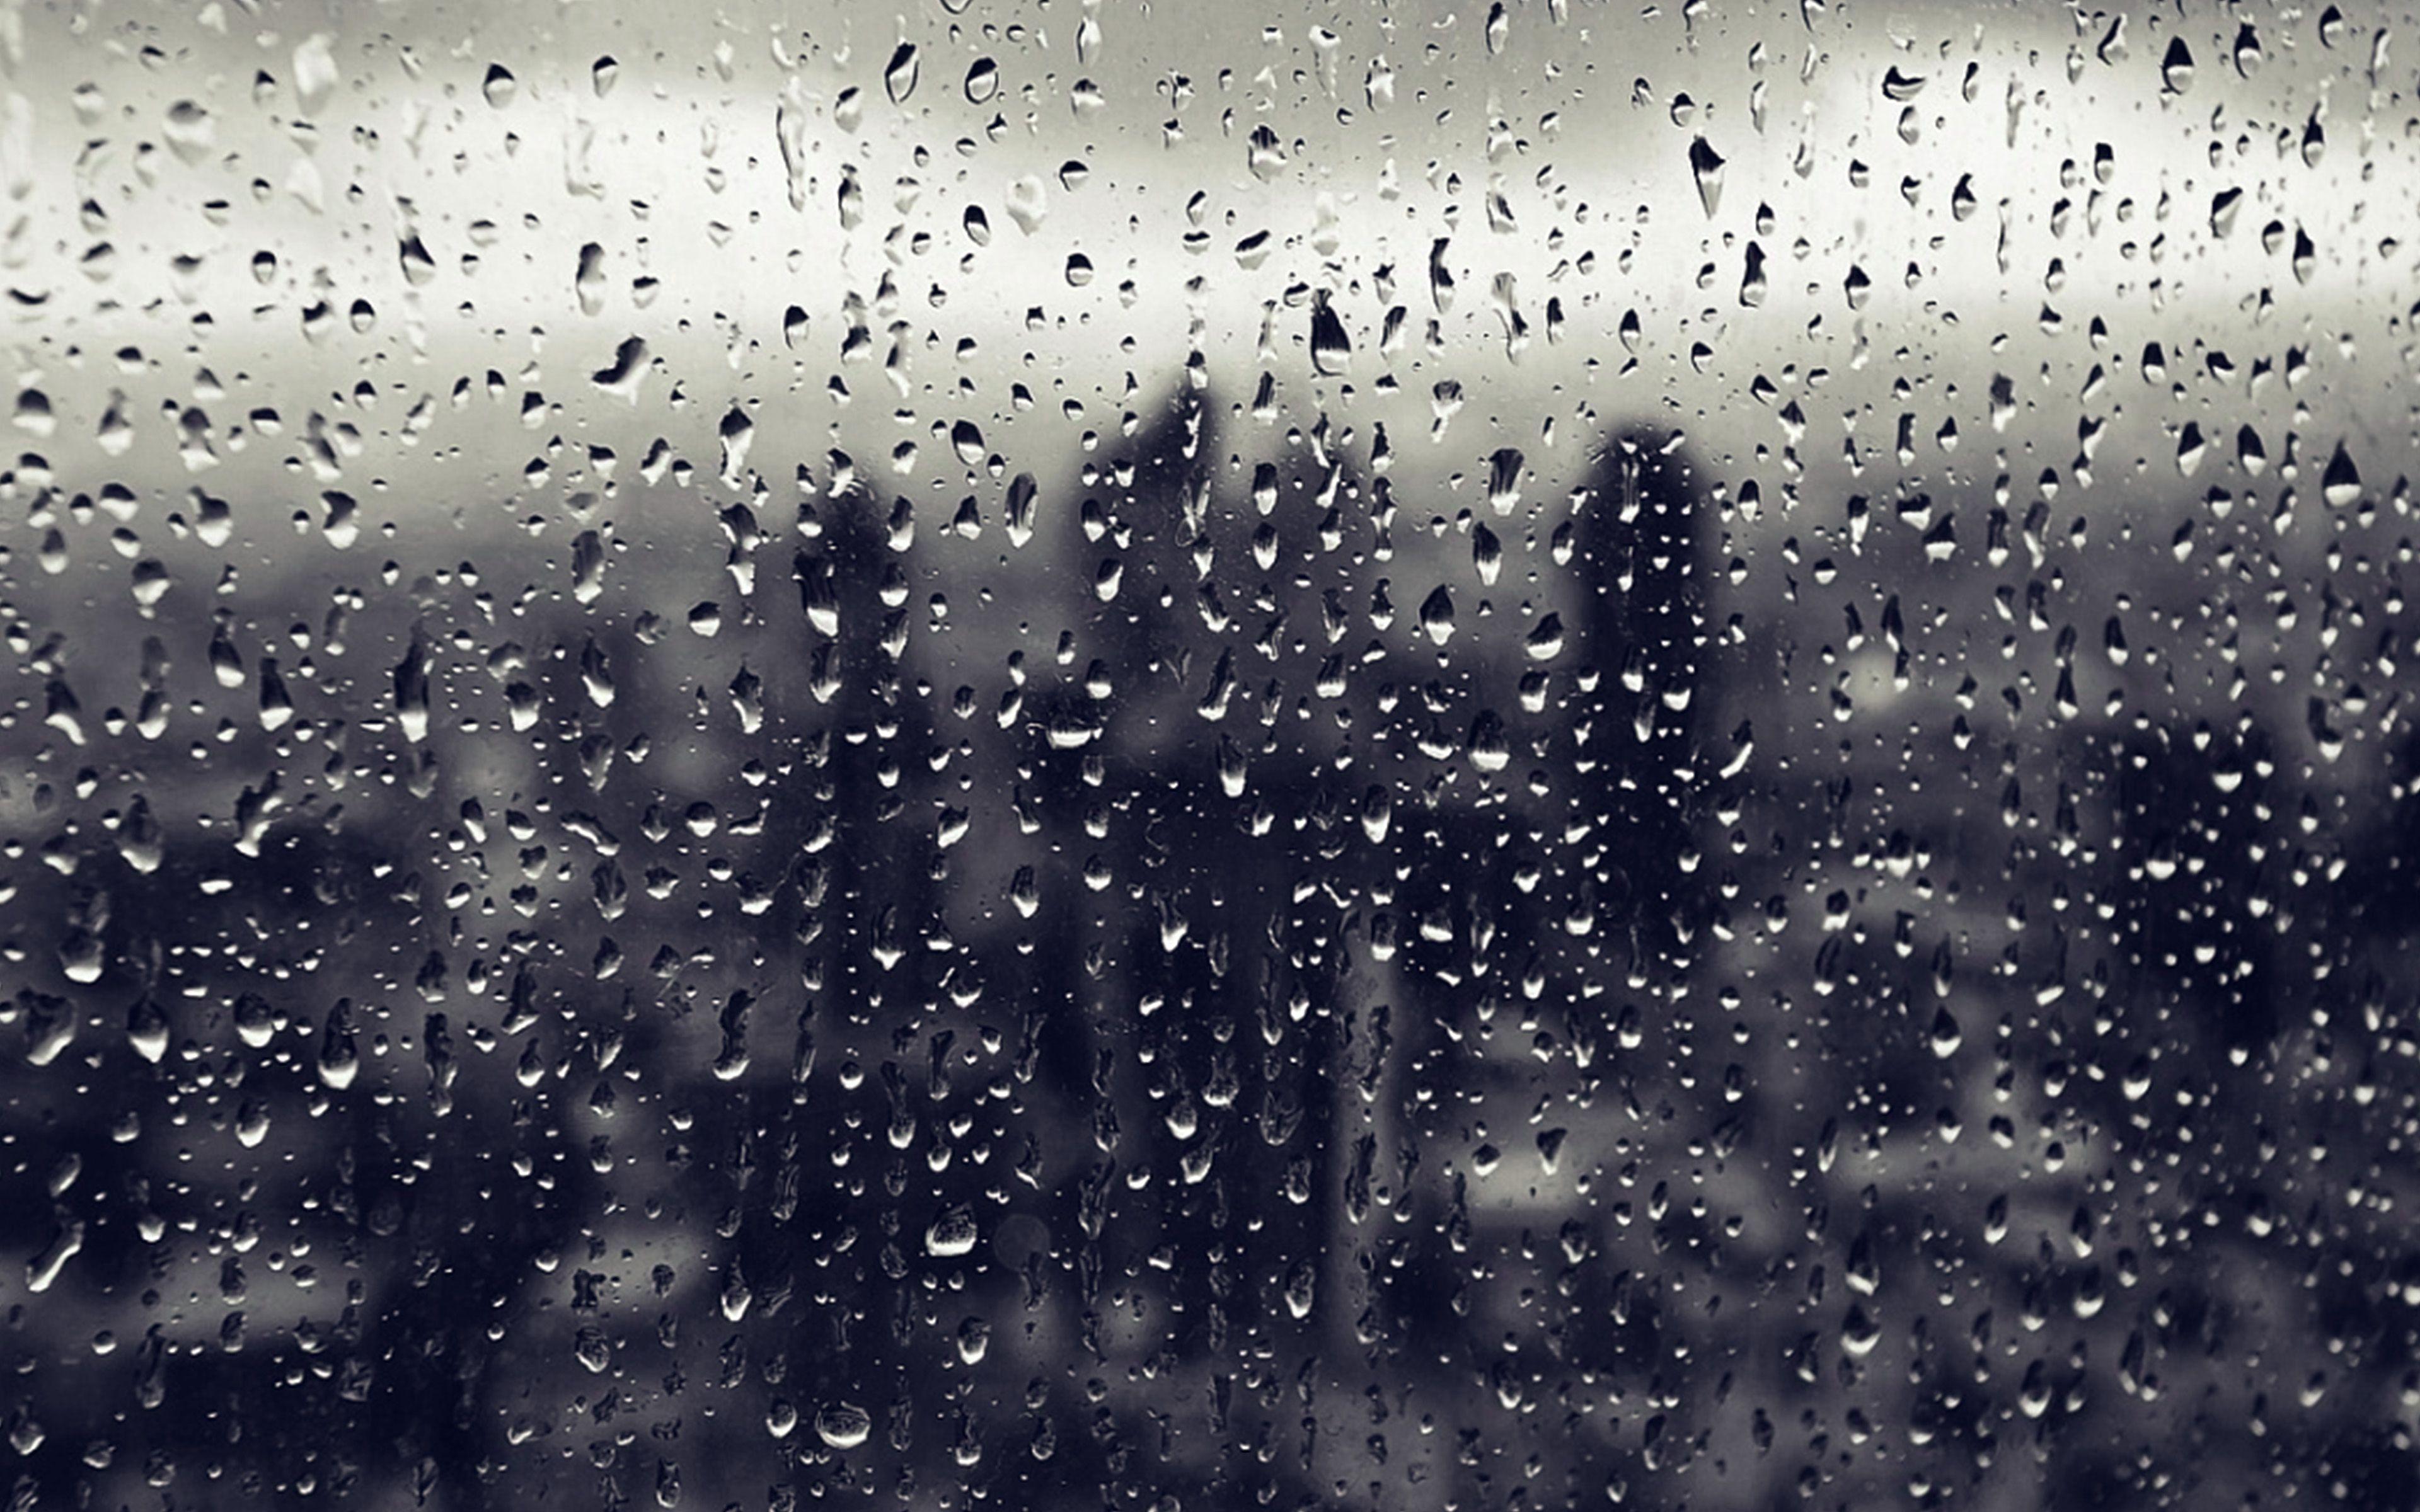 Rain 4K Wallpapers - Top Free Rain 4K Backgrounds ...